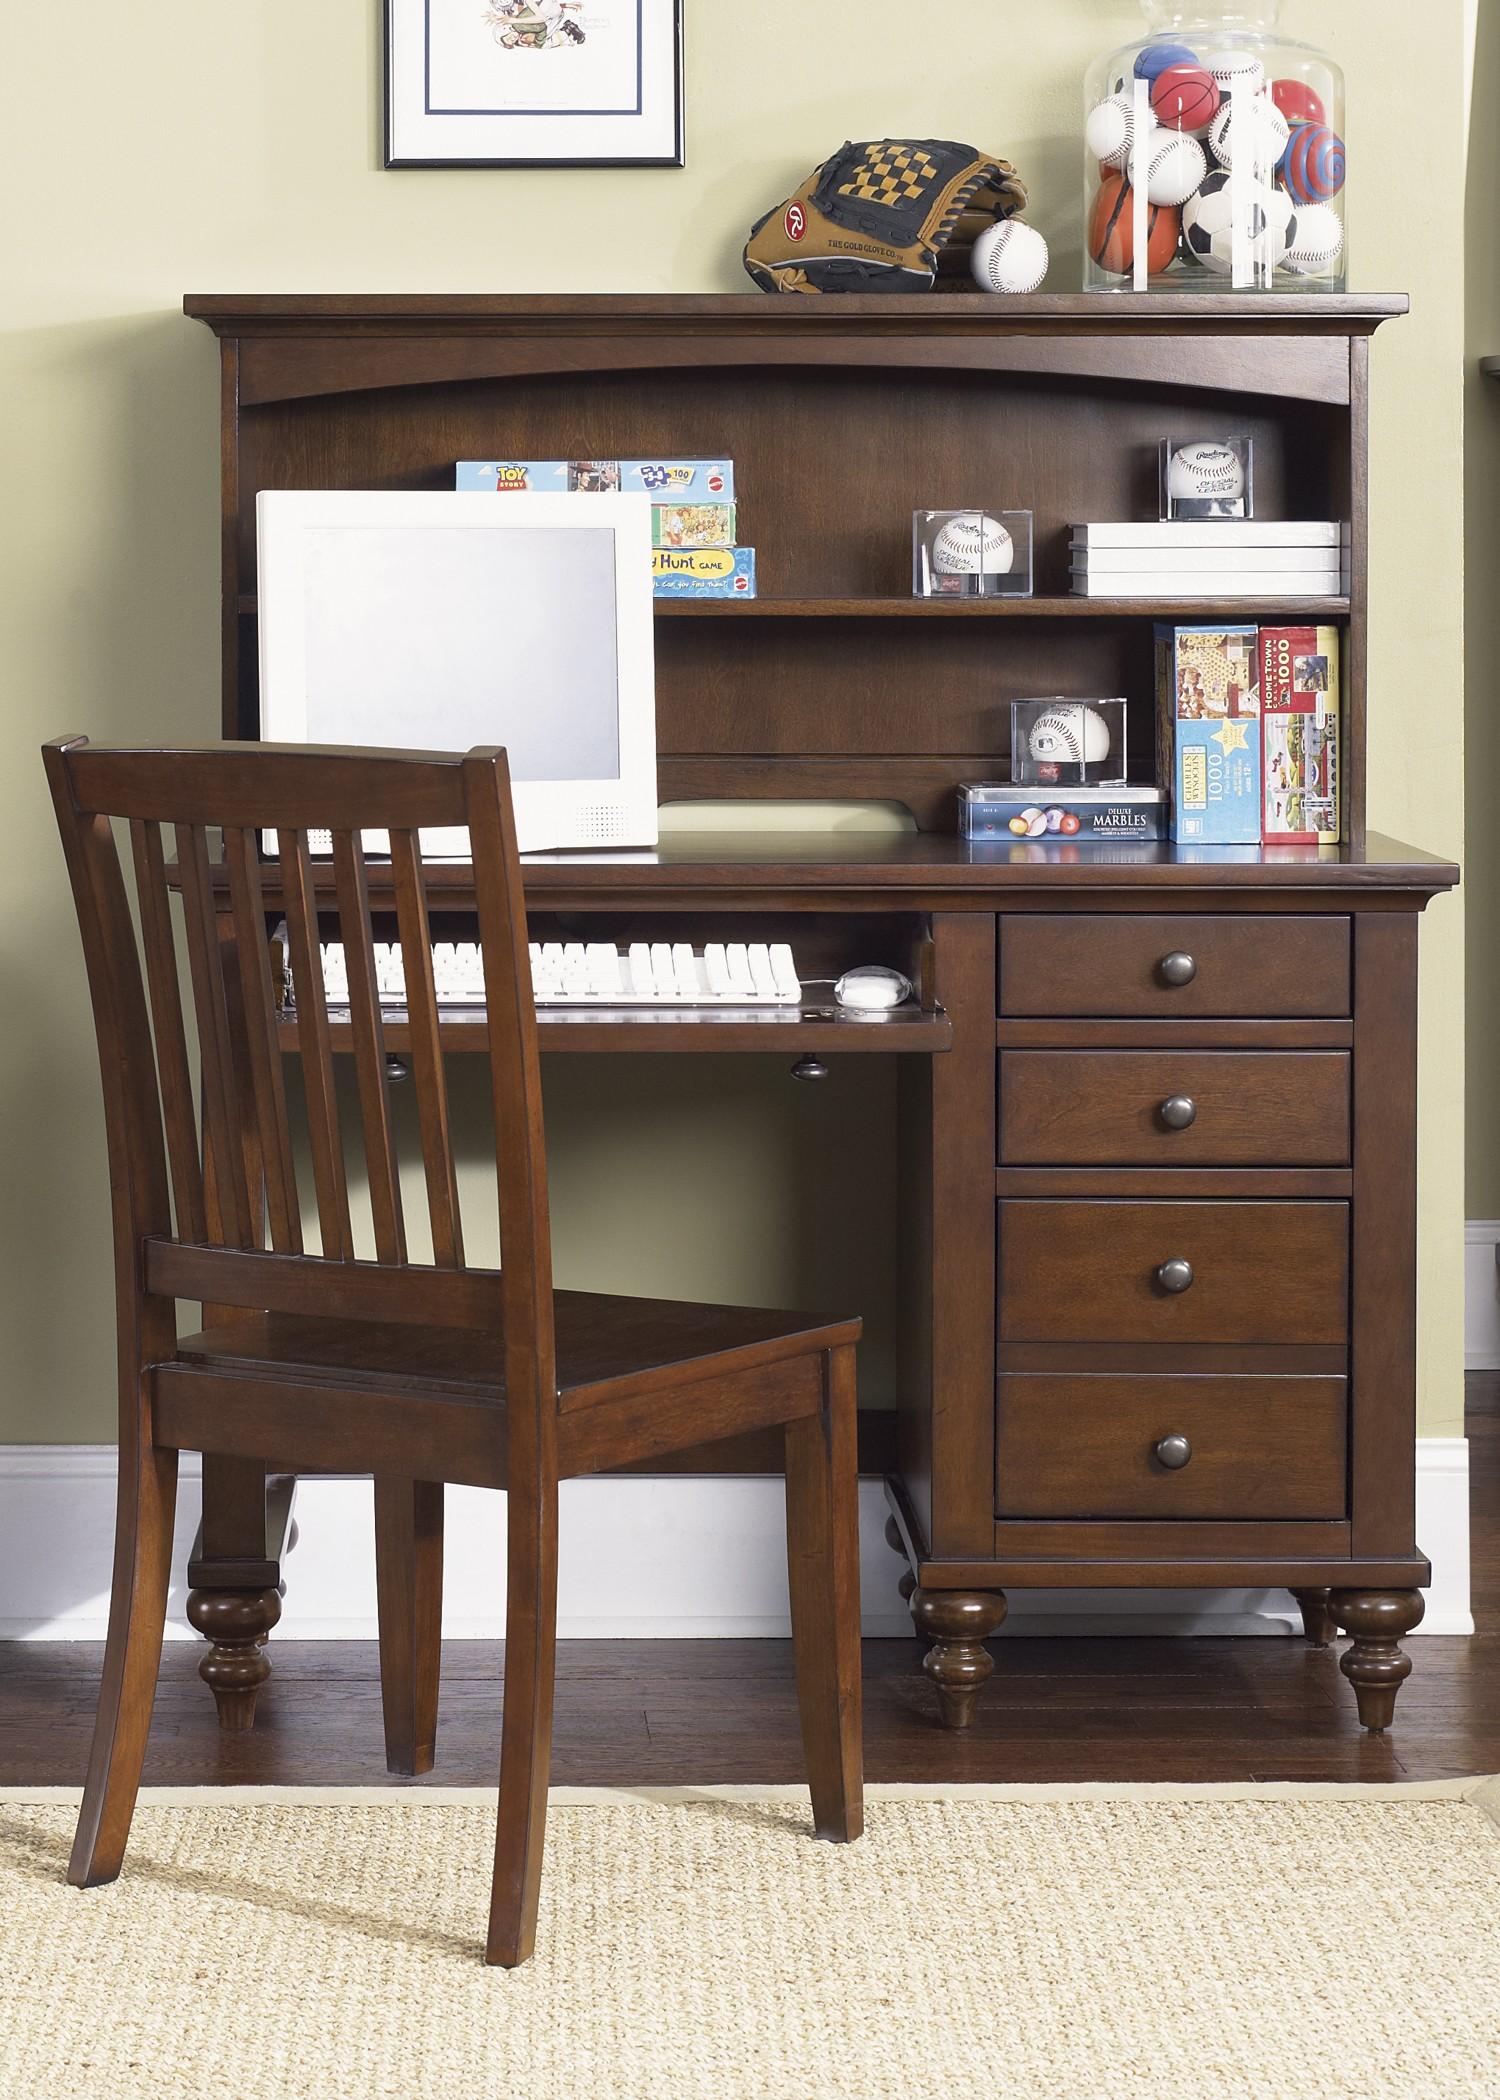 Abbott Ridge Student Desk With Hutch From Liberty 277 Ybr